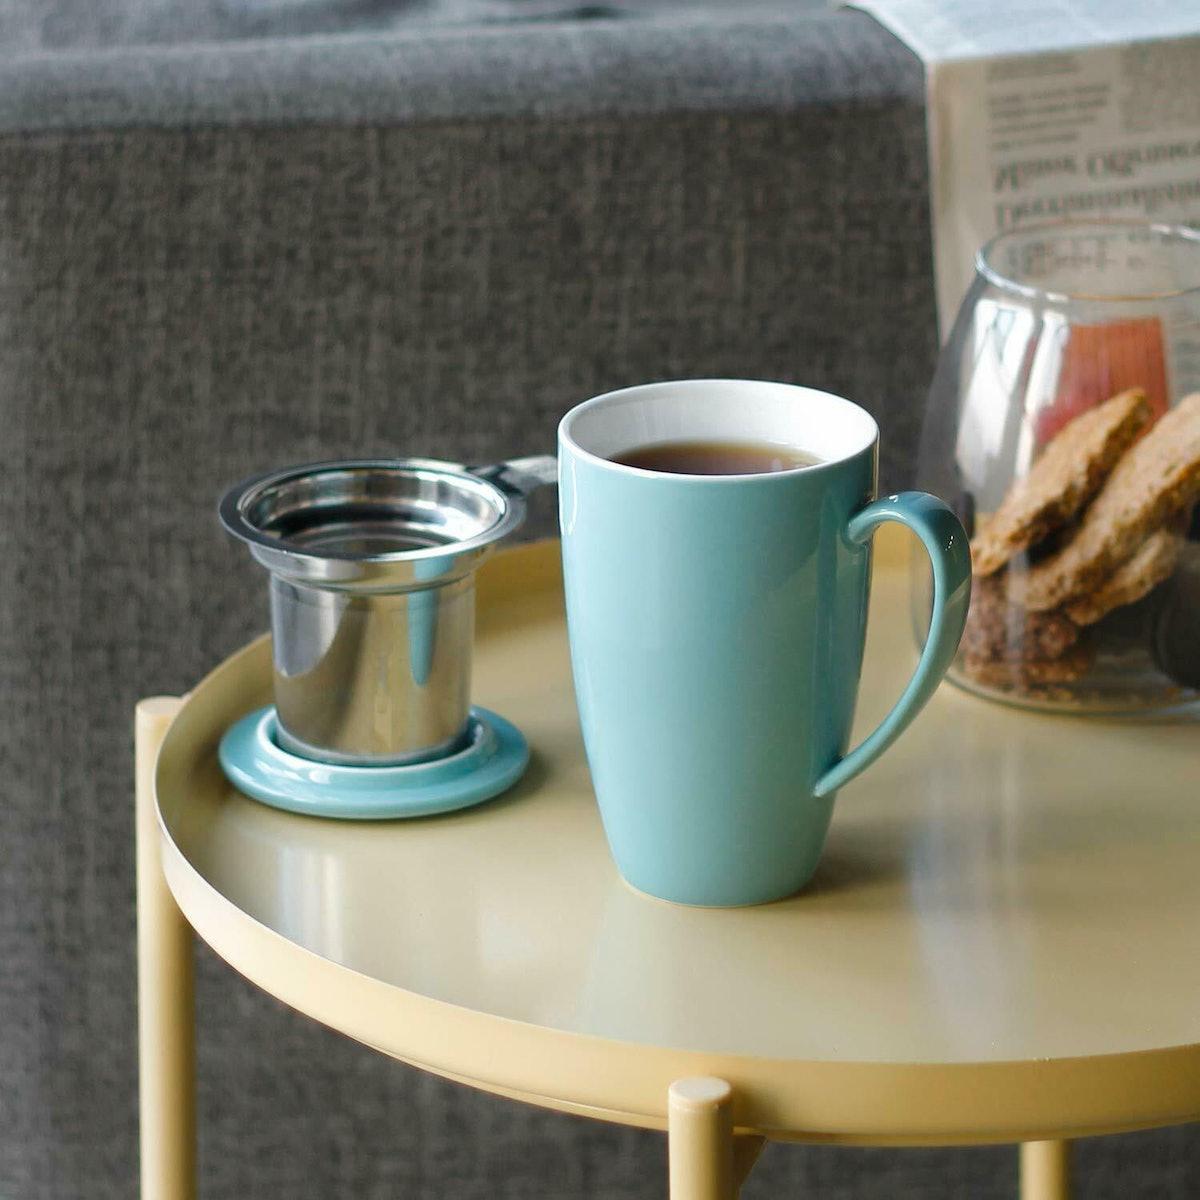 Sweese Tea Infuser Mug